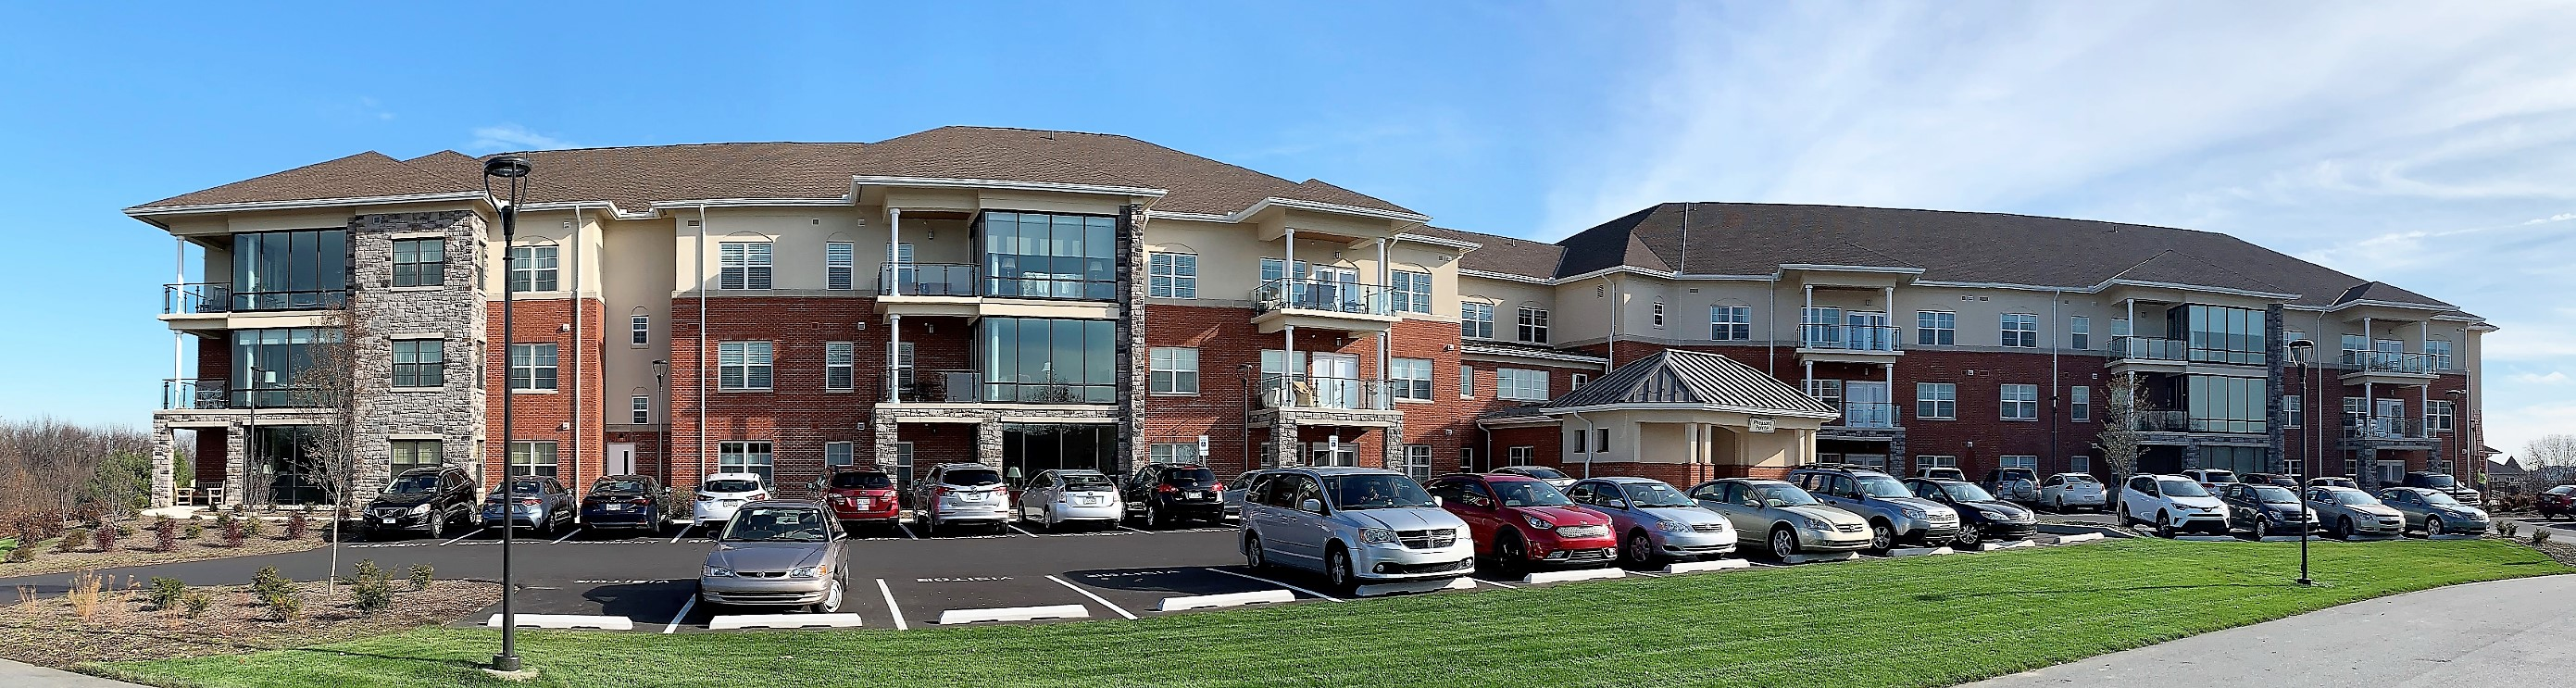 Woodcrest Villa complex adds Ferric railings to apartment balconies